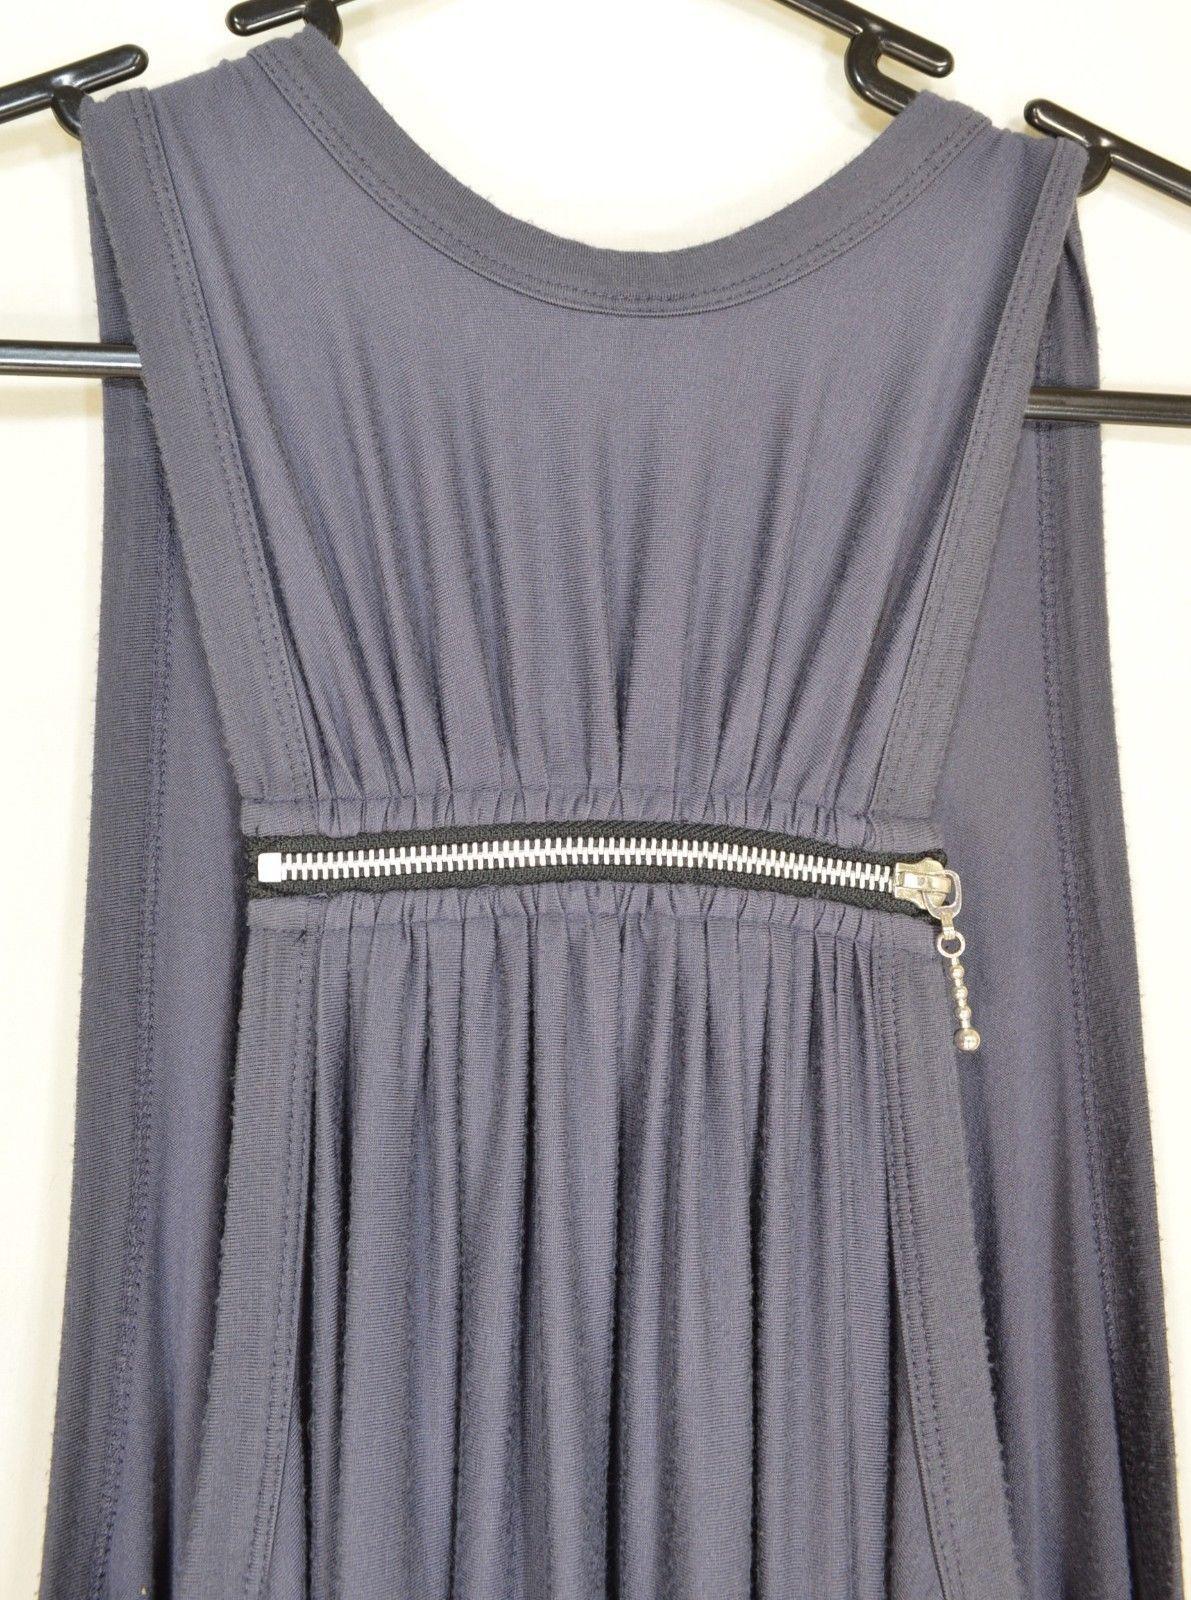 Comfy USA tunic dress SZ S gray sleeveless asymmetrical racer back lagenlook